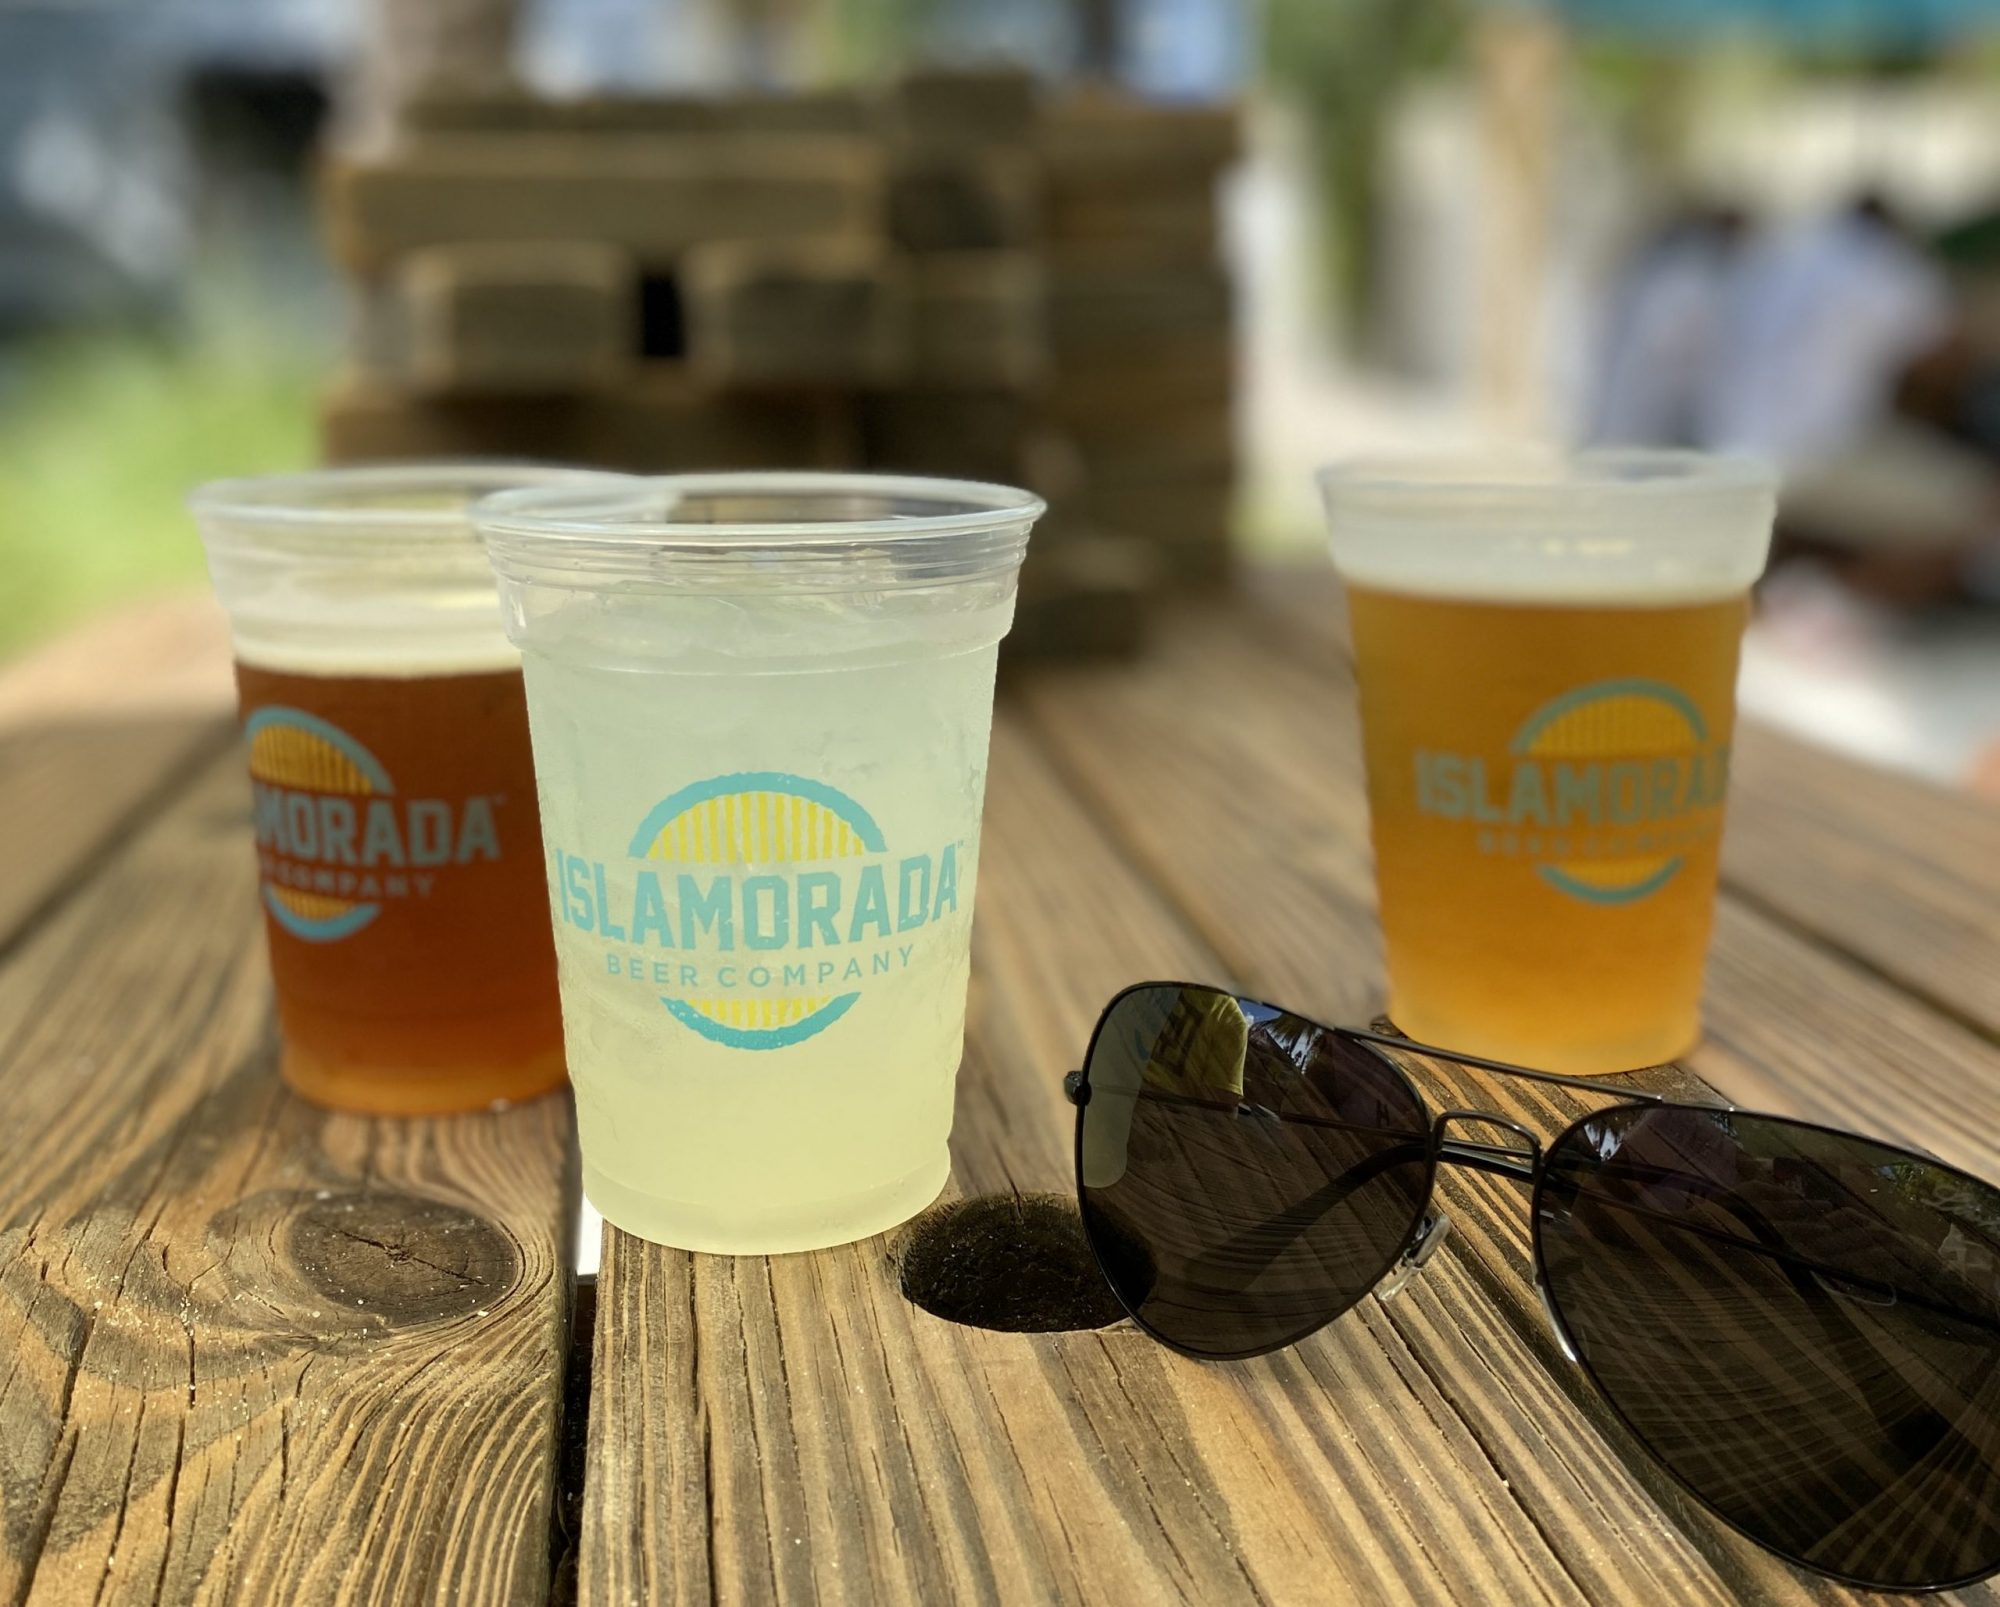 verres de bières fraiches sur une table en bois dans le patio de la Islamorada Brewery and Distillery. Une adresse des Keys recommandée par Miami Off Road